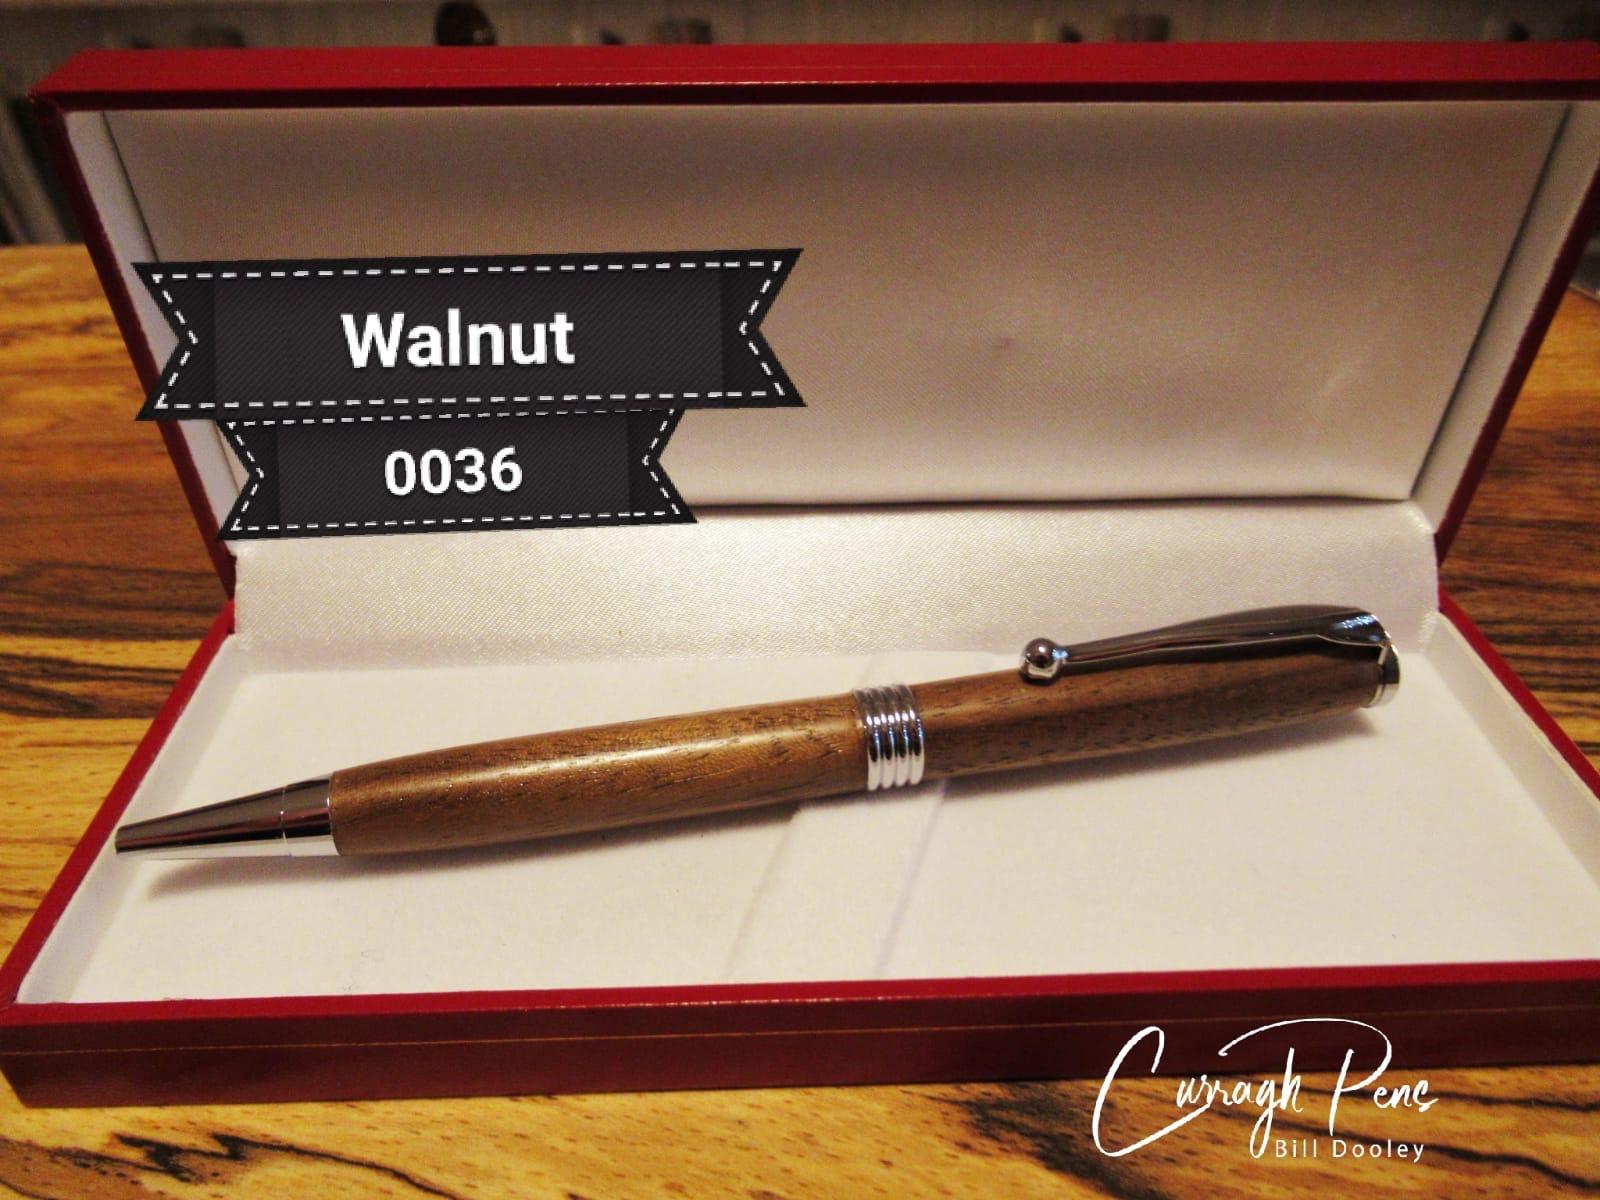 Streamline Pen 0036